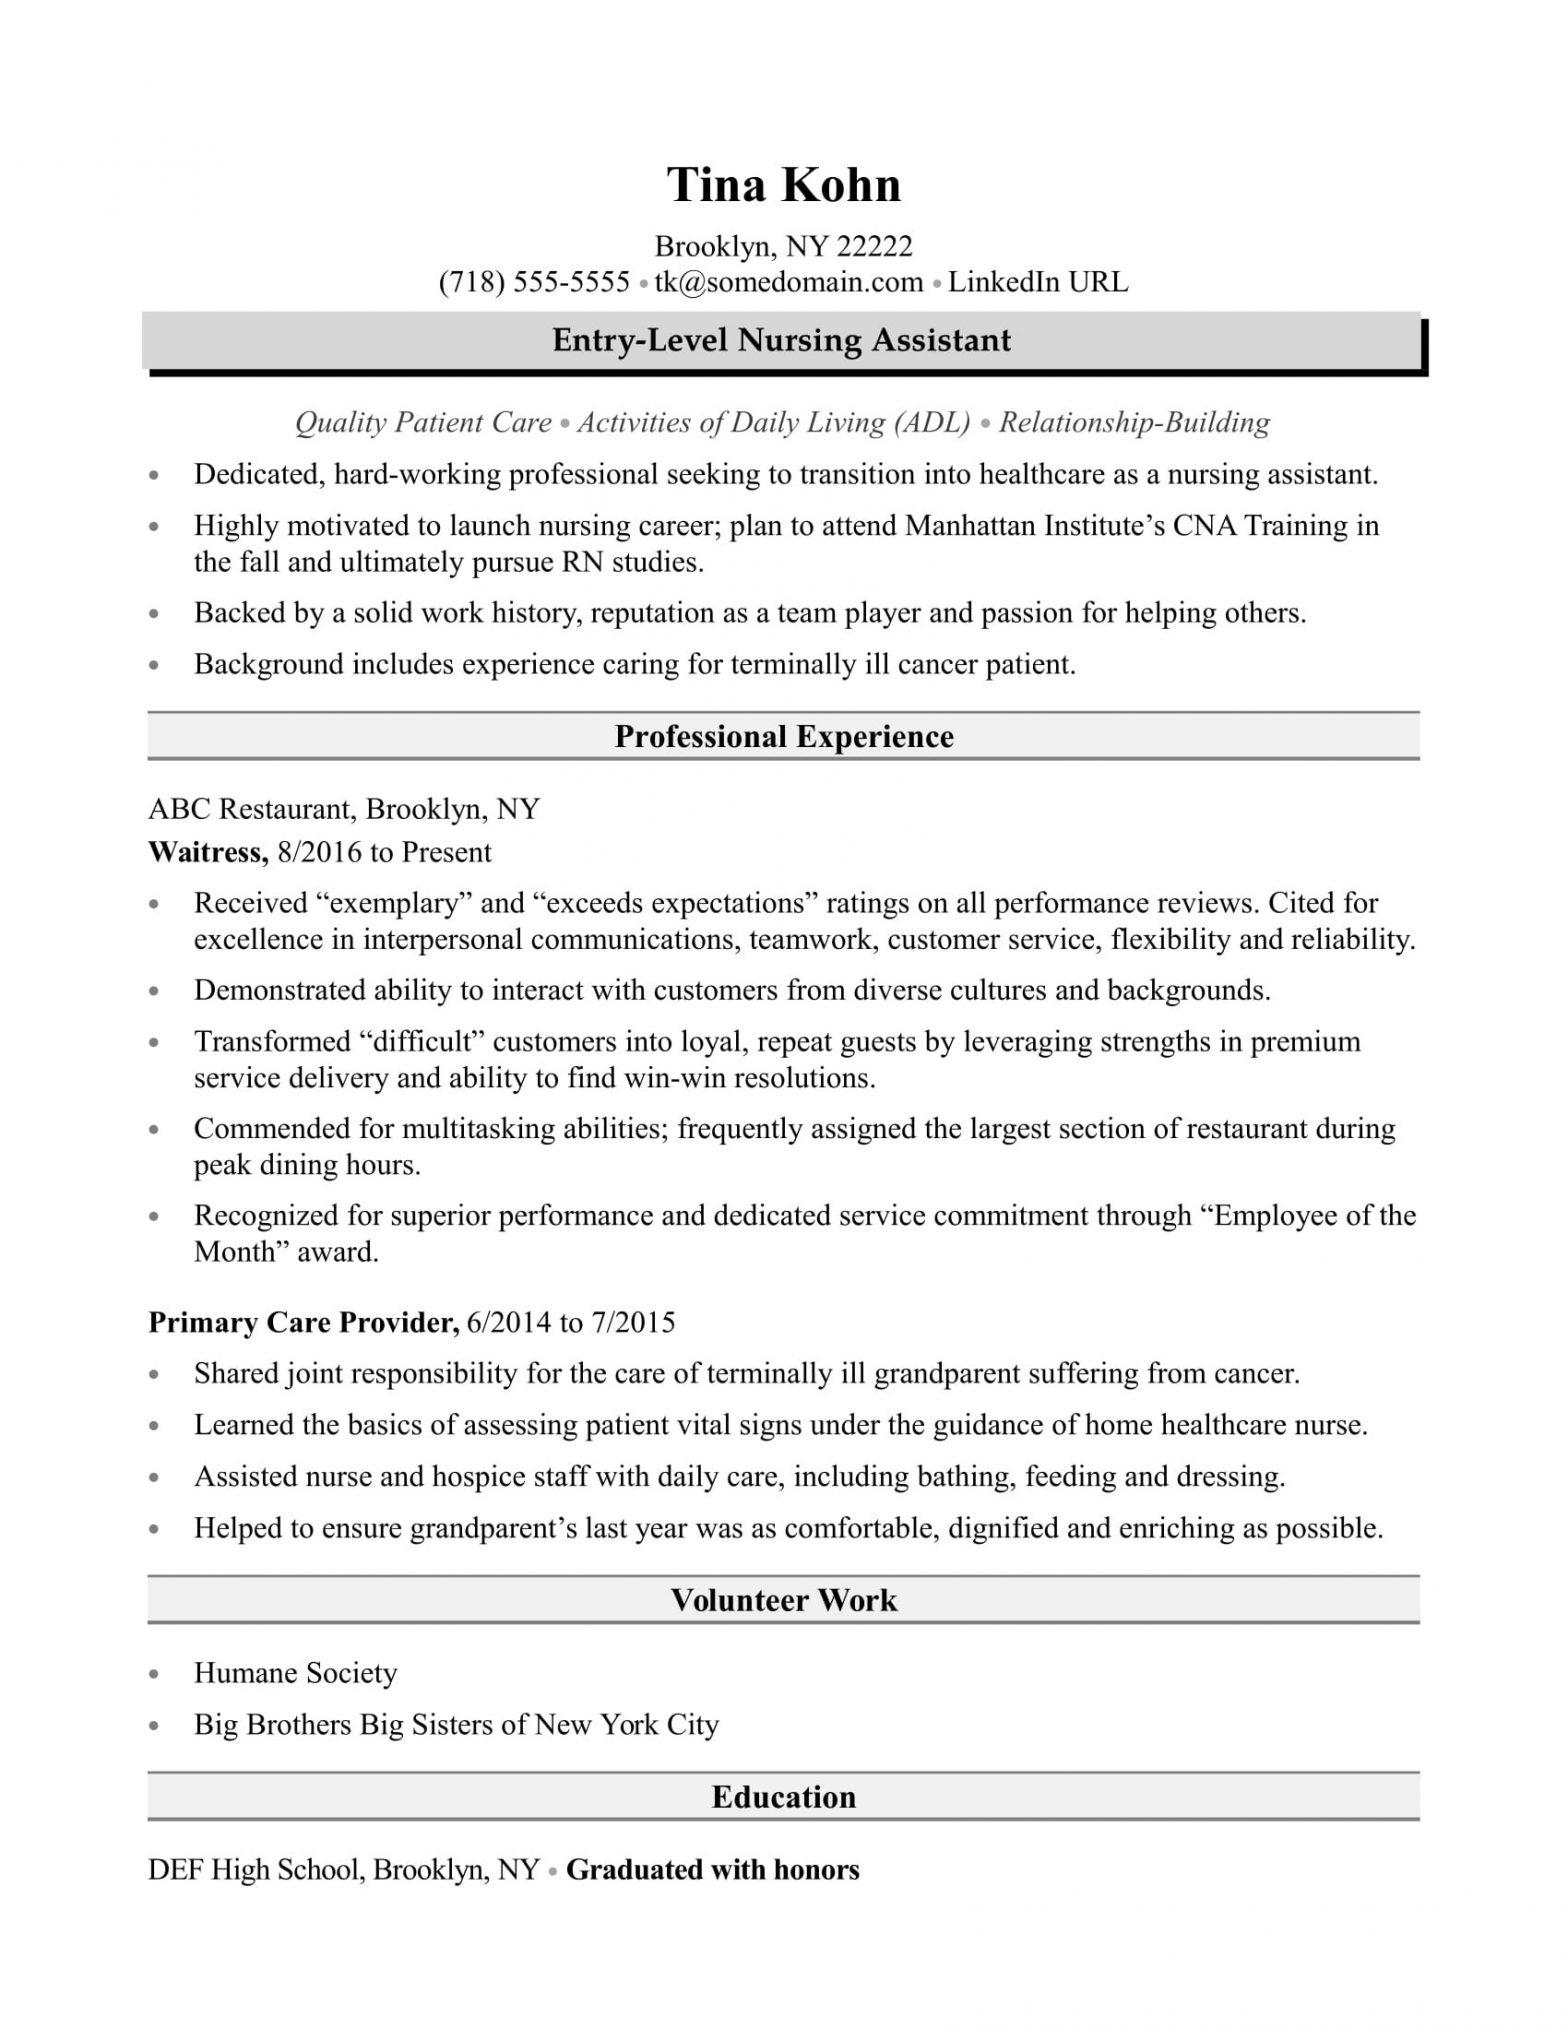 Cna Resume Sample with No Work Experience Nursing assistant Resume Sample Monster.com